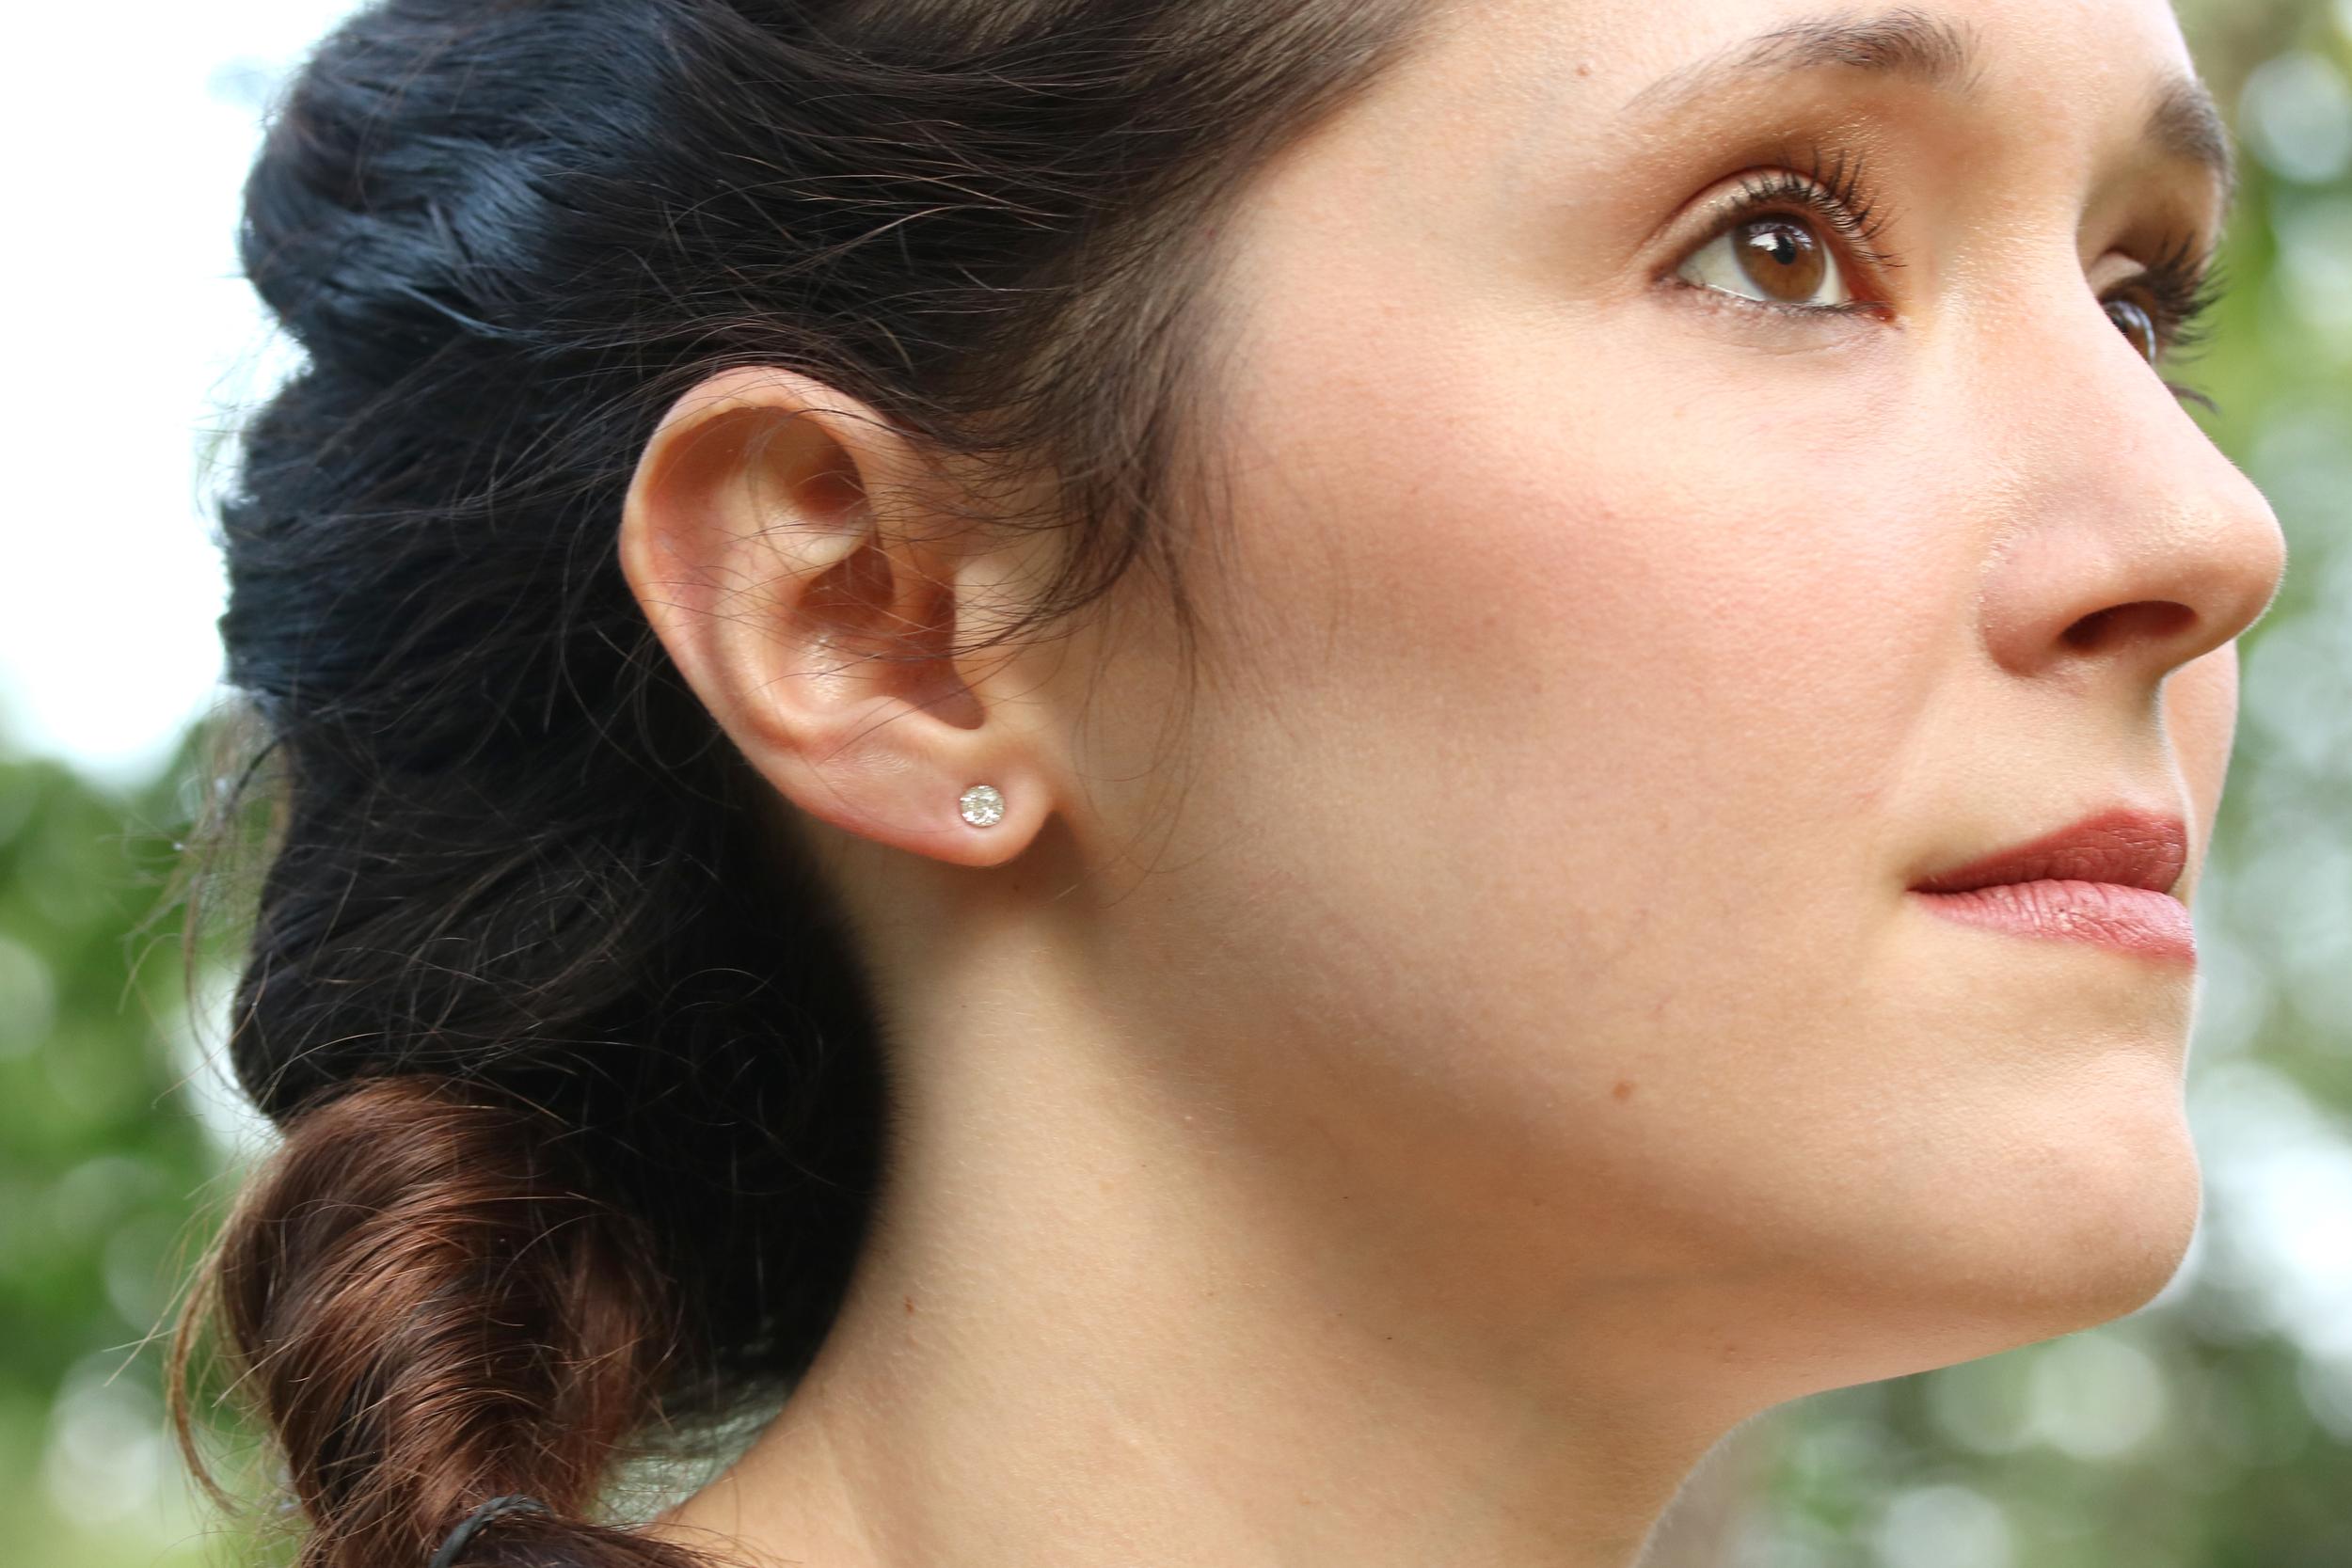 super tiny post earrings